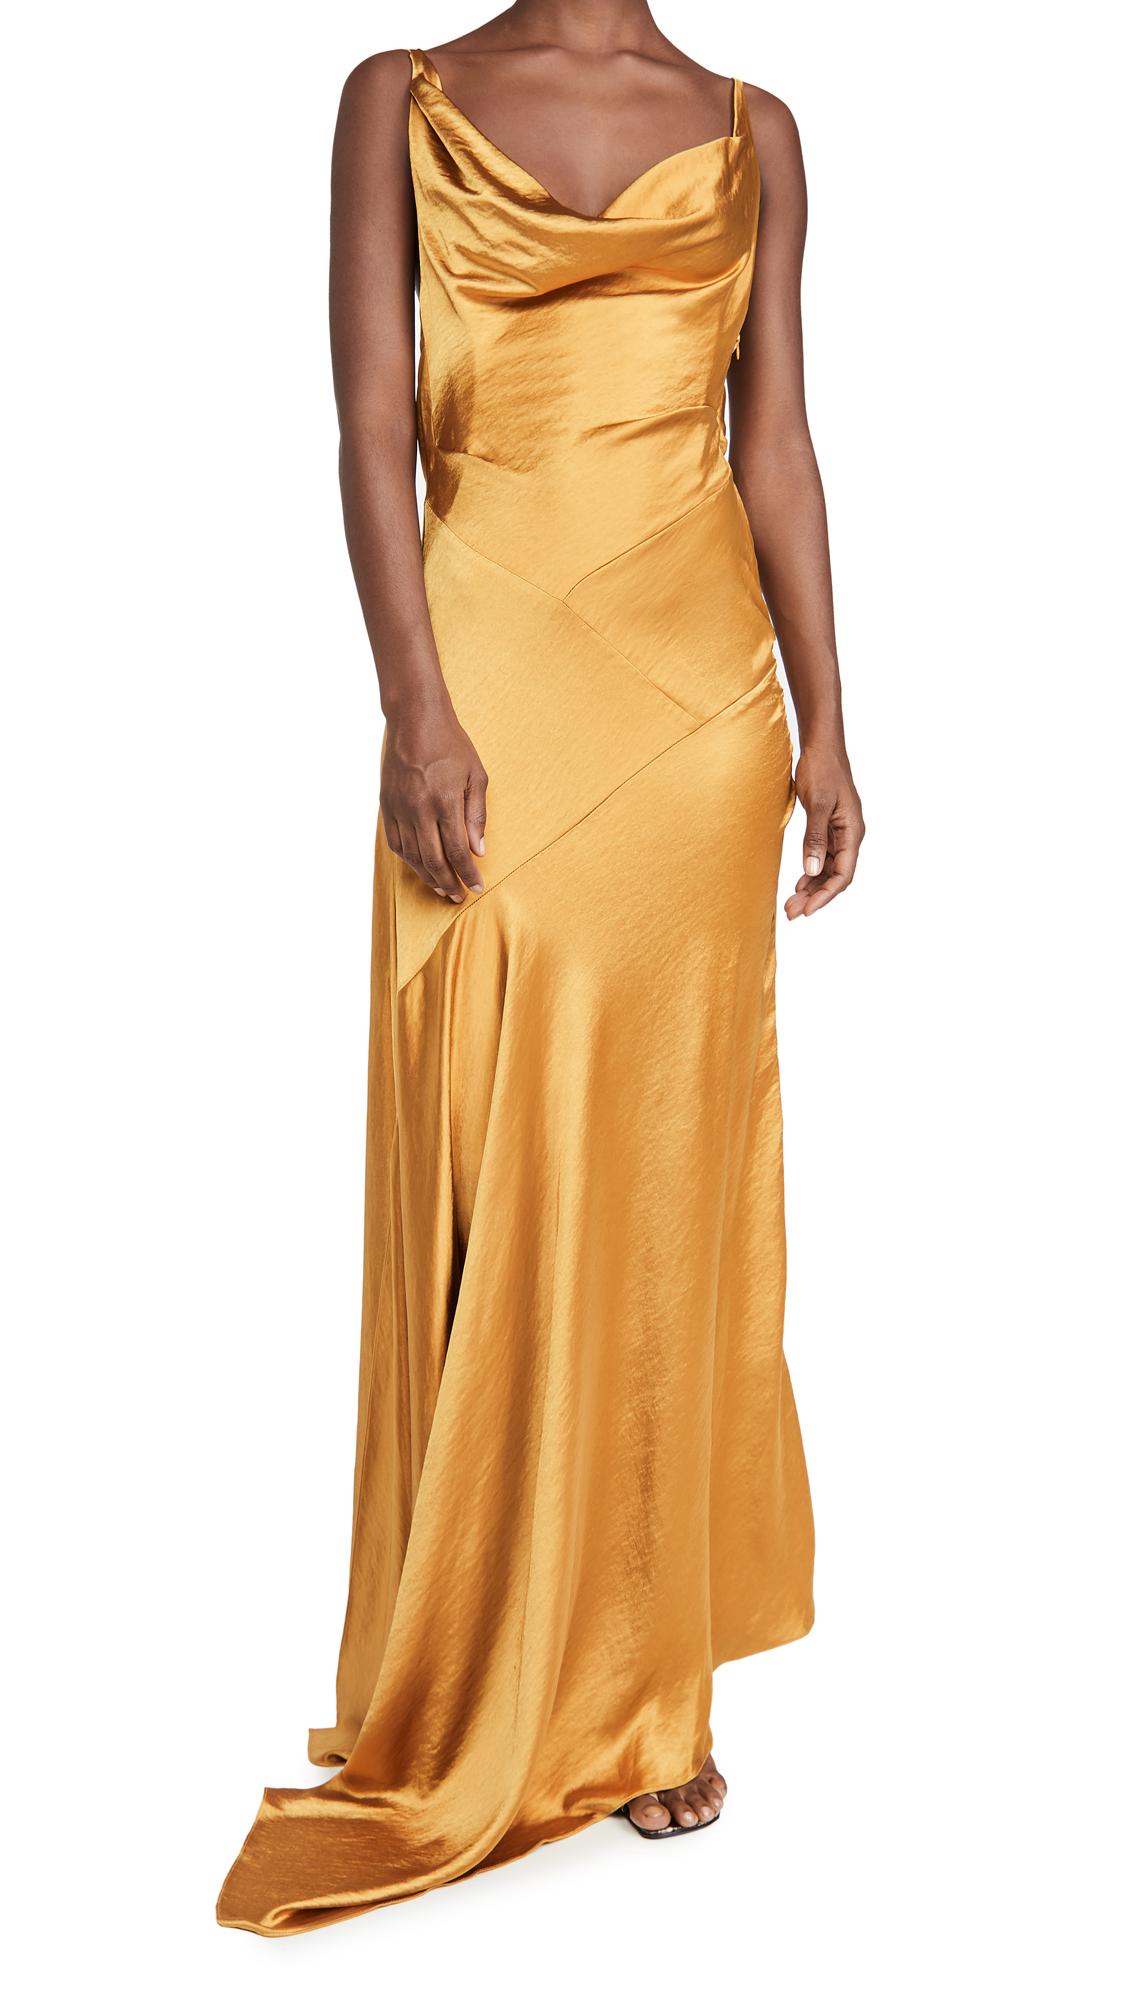 Solace London Aletta Maxi Dress